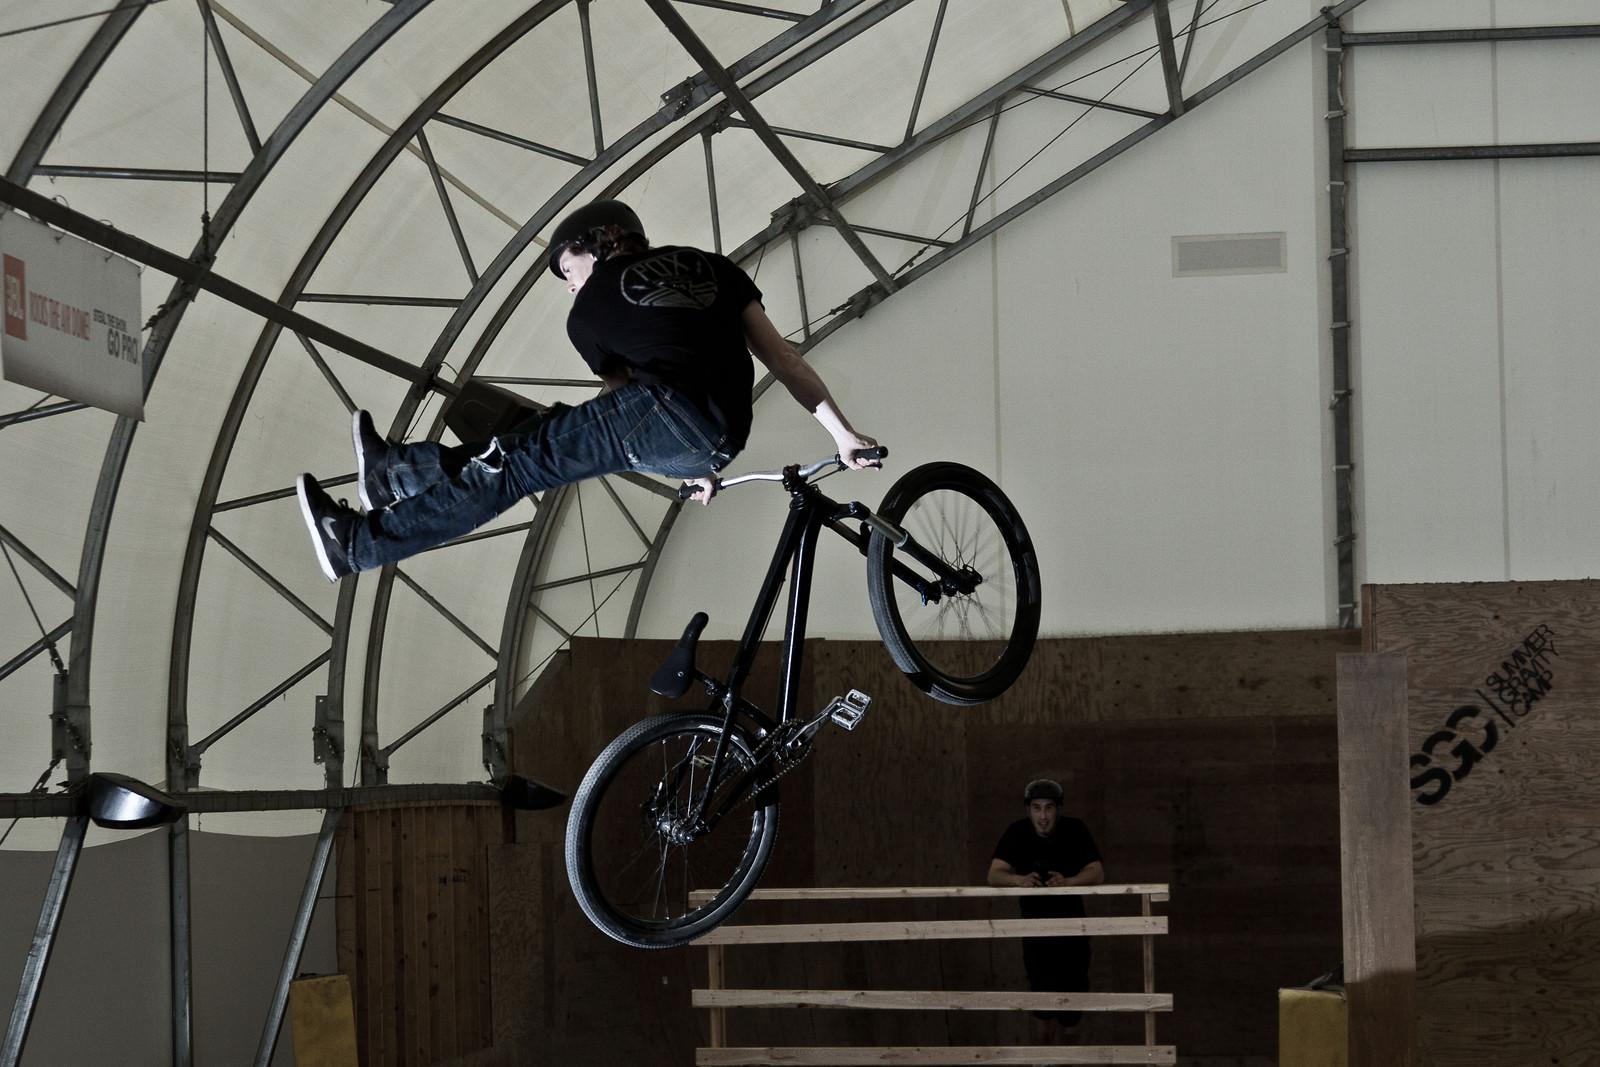 vital-1 - KazYamamura - Mountain Biking Pictures - Vital MTB